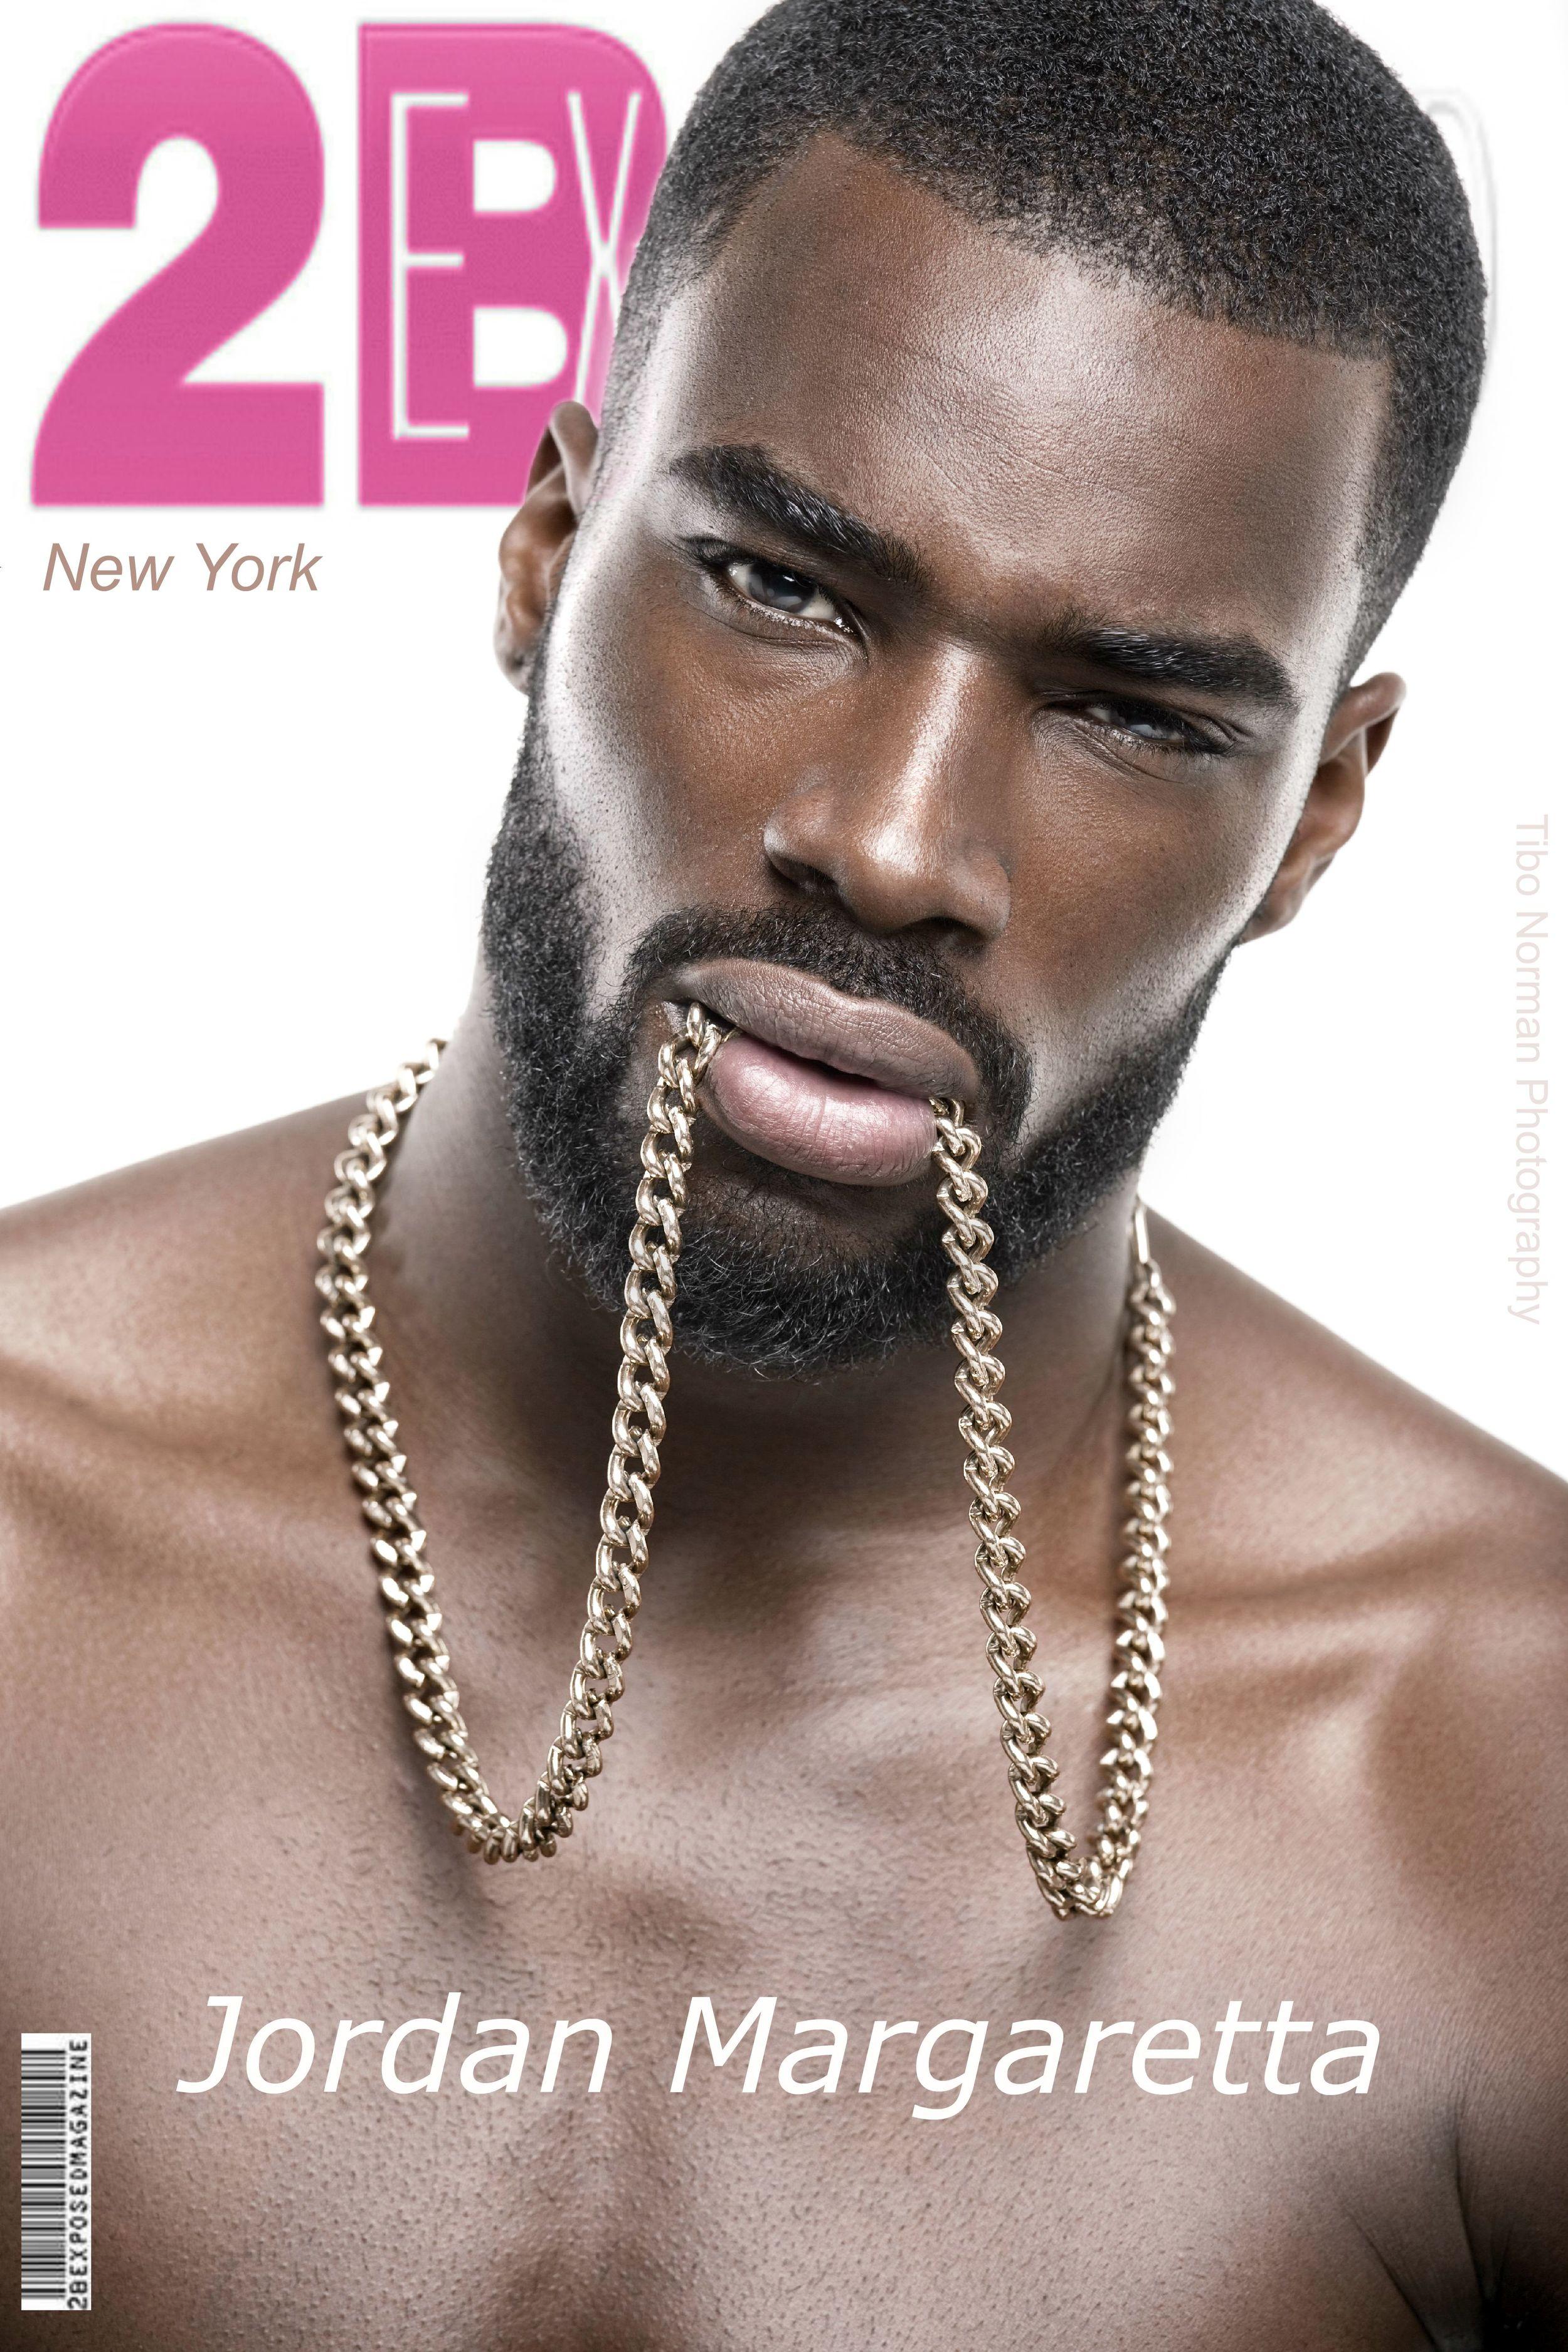 2Bexposed magazine (model: Jordan Margaretta)